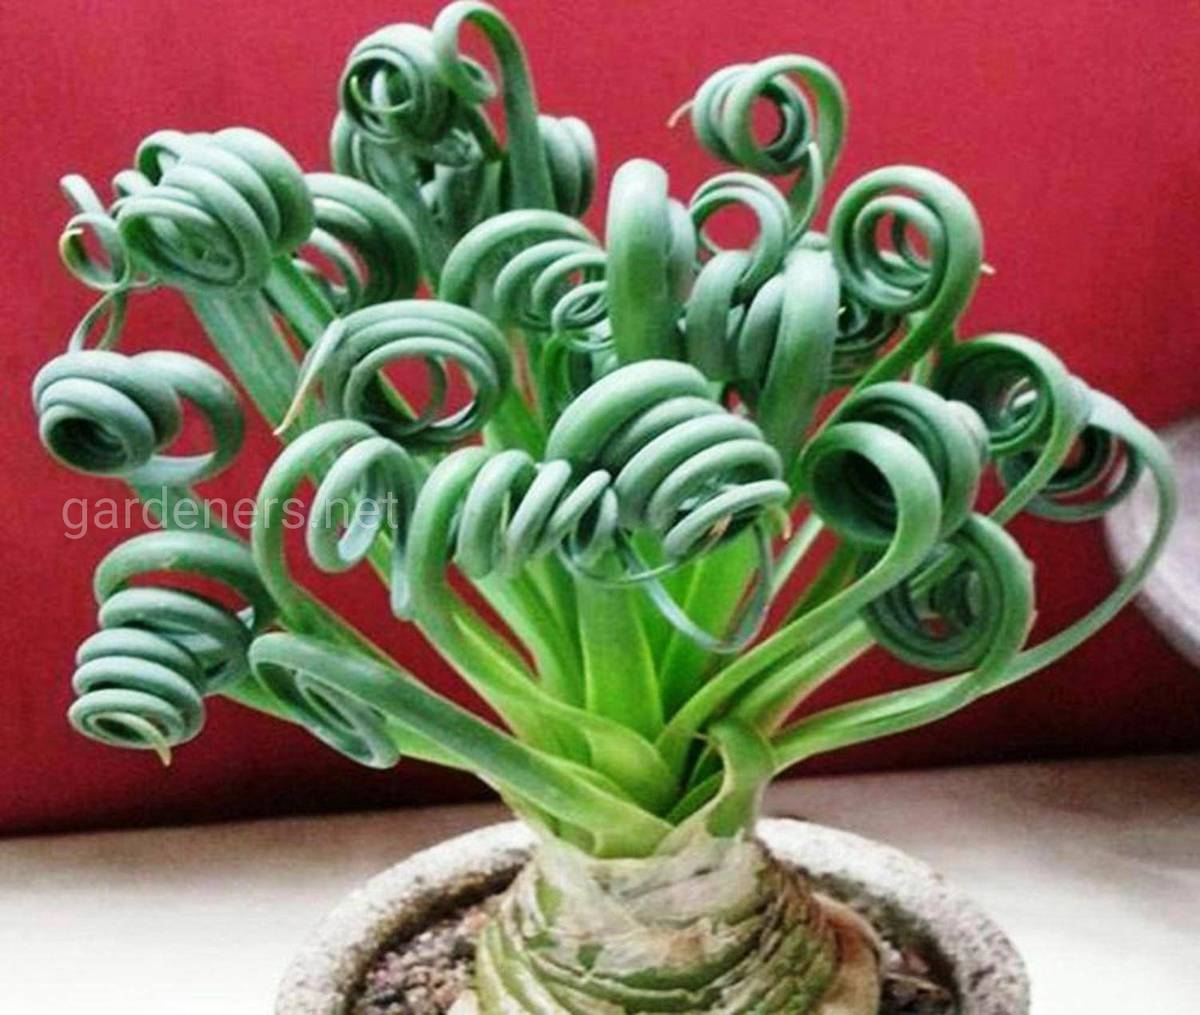 Moraea tortilis или Spiral Grass